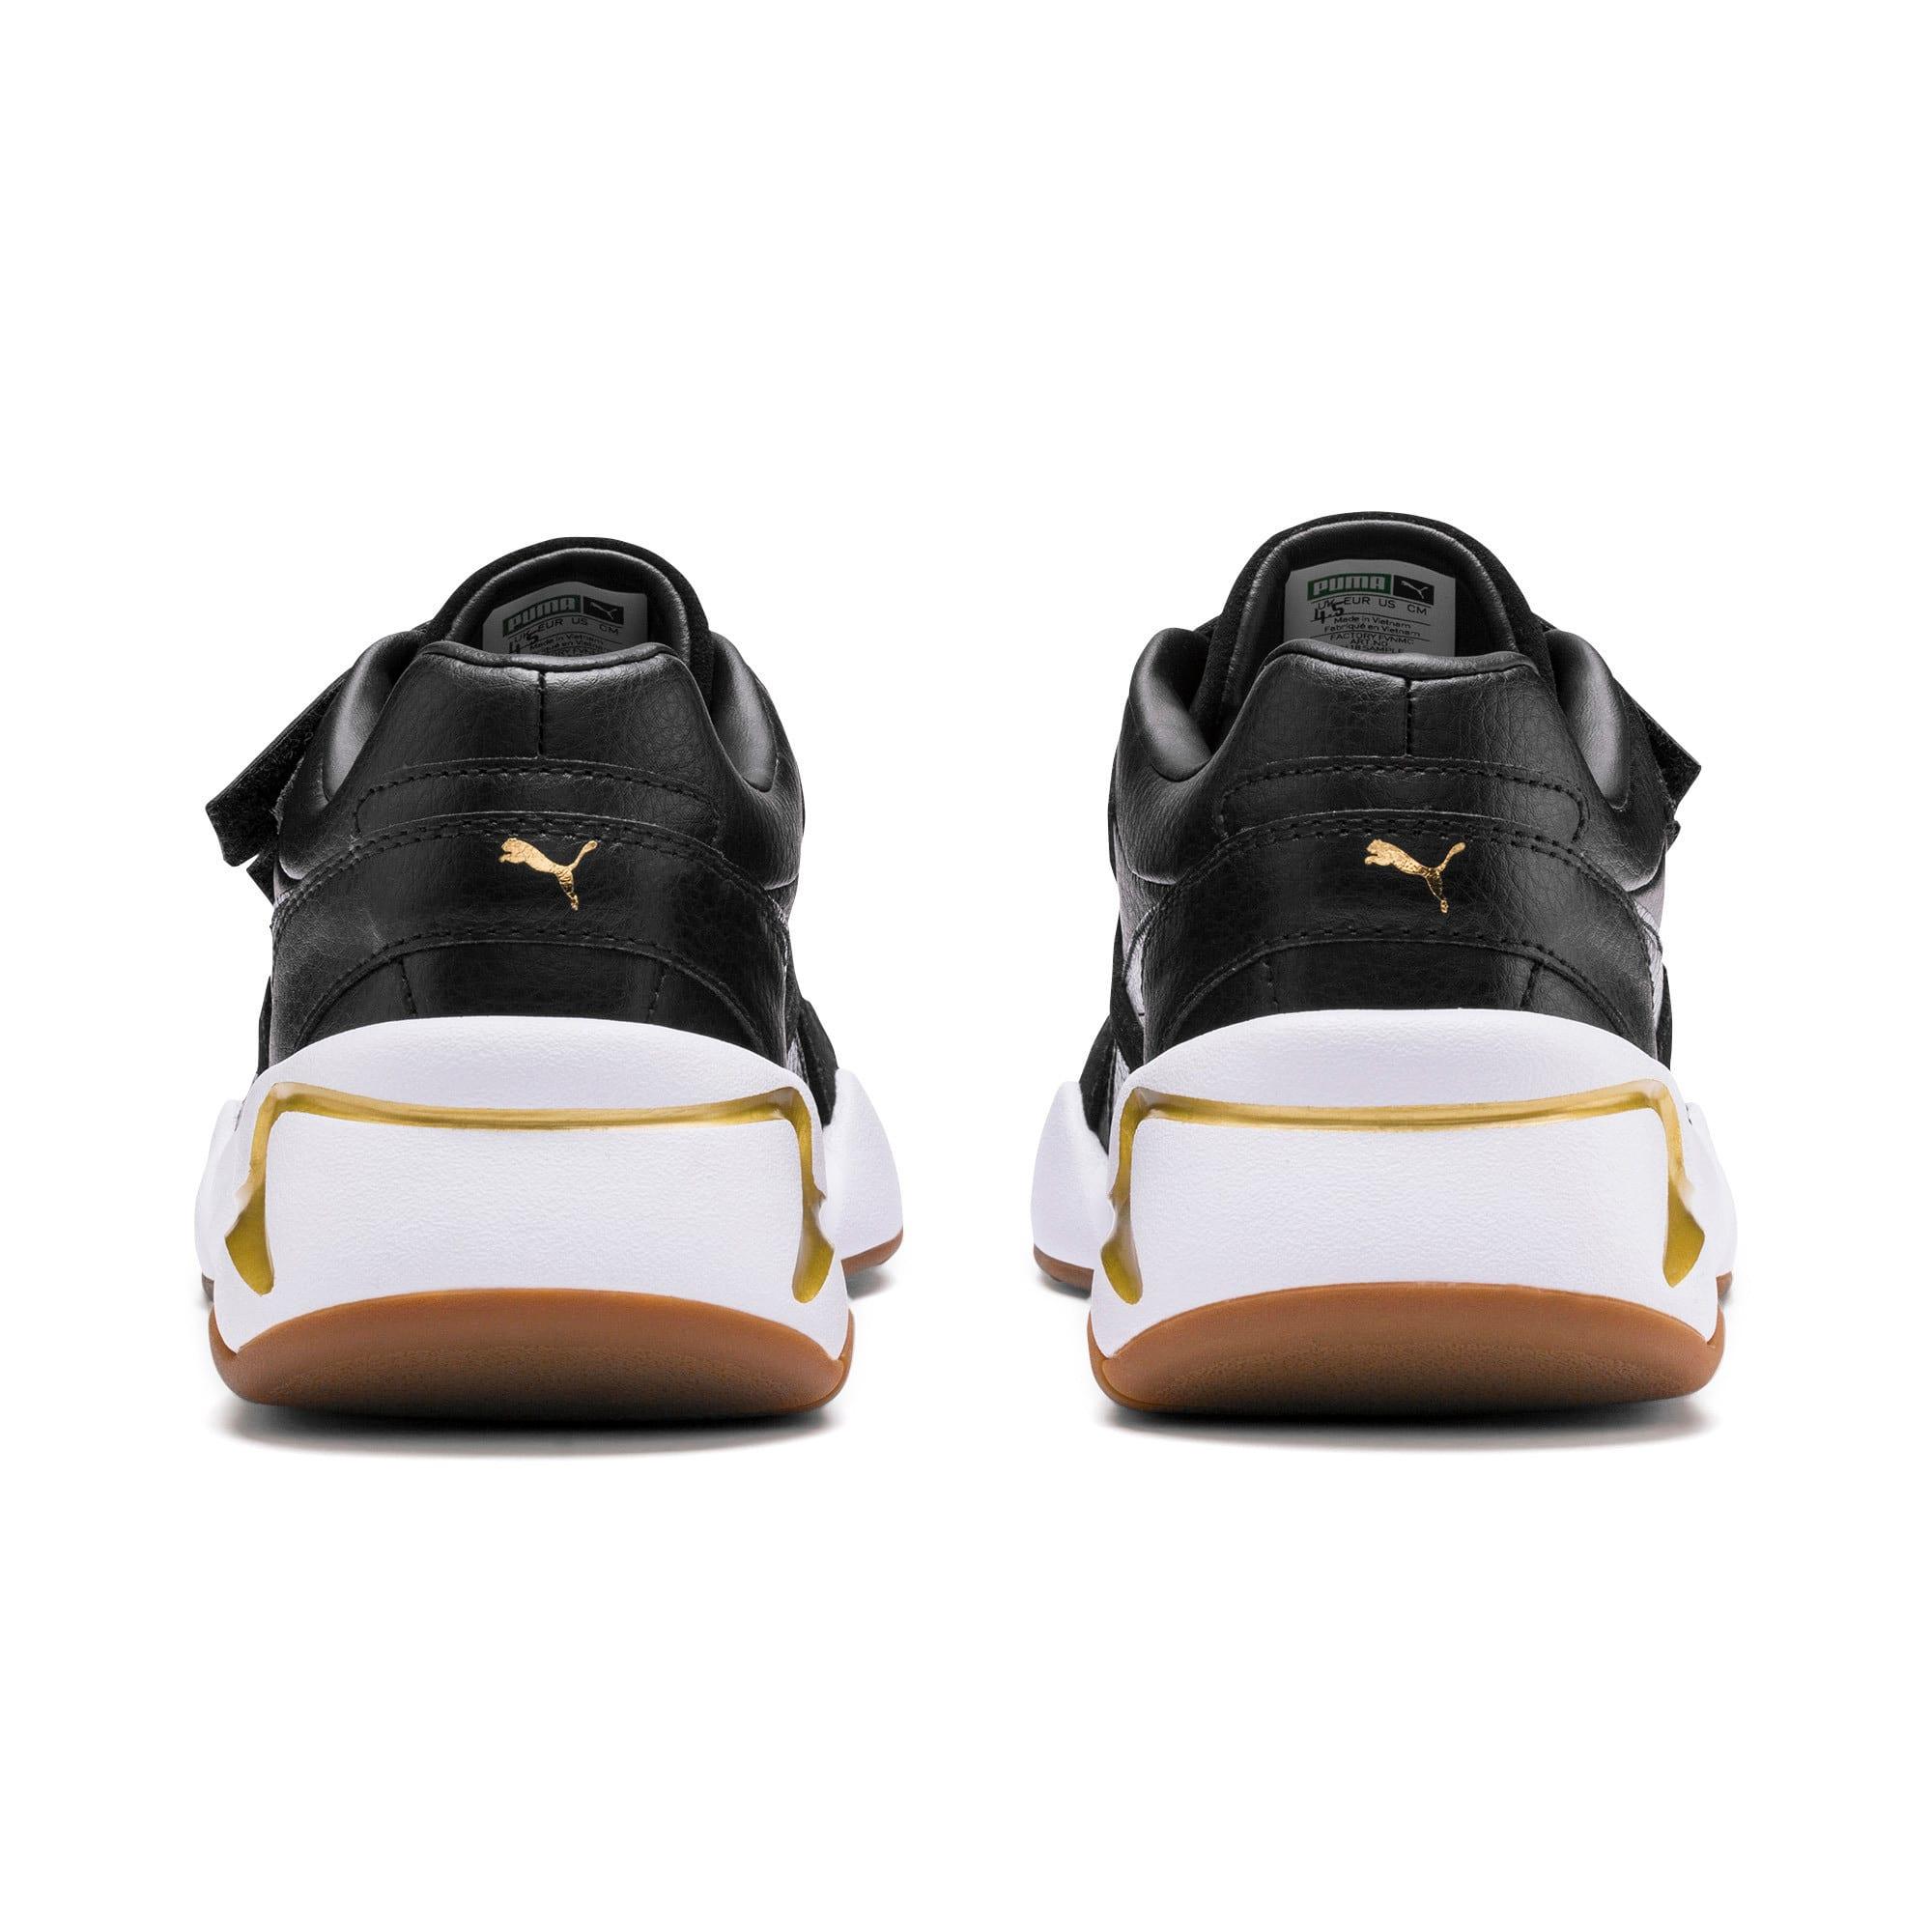 Thumbnail 4 of Nova V sportschoenen van leer voor dames, Puma Black-Puma Team Gold, medium